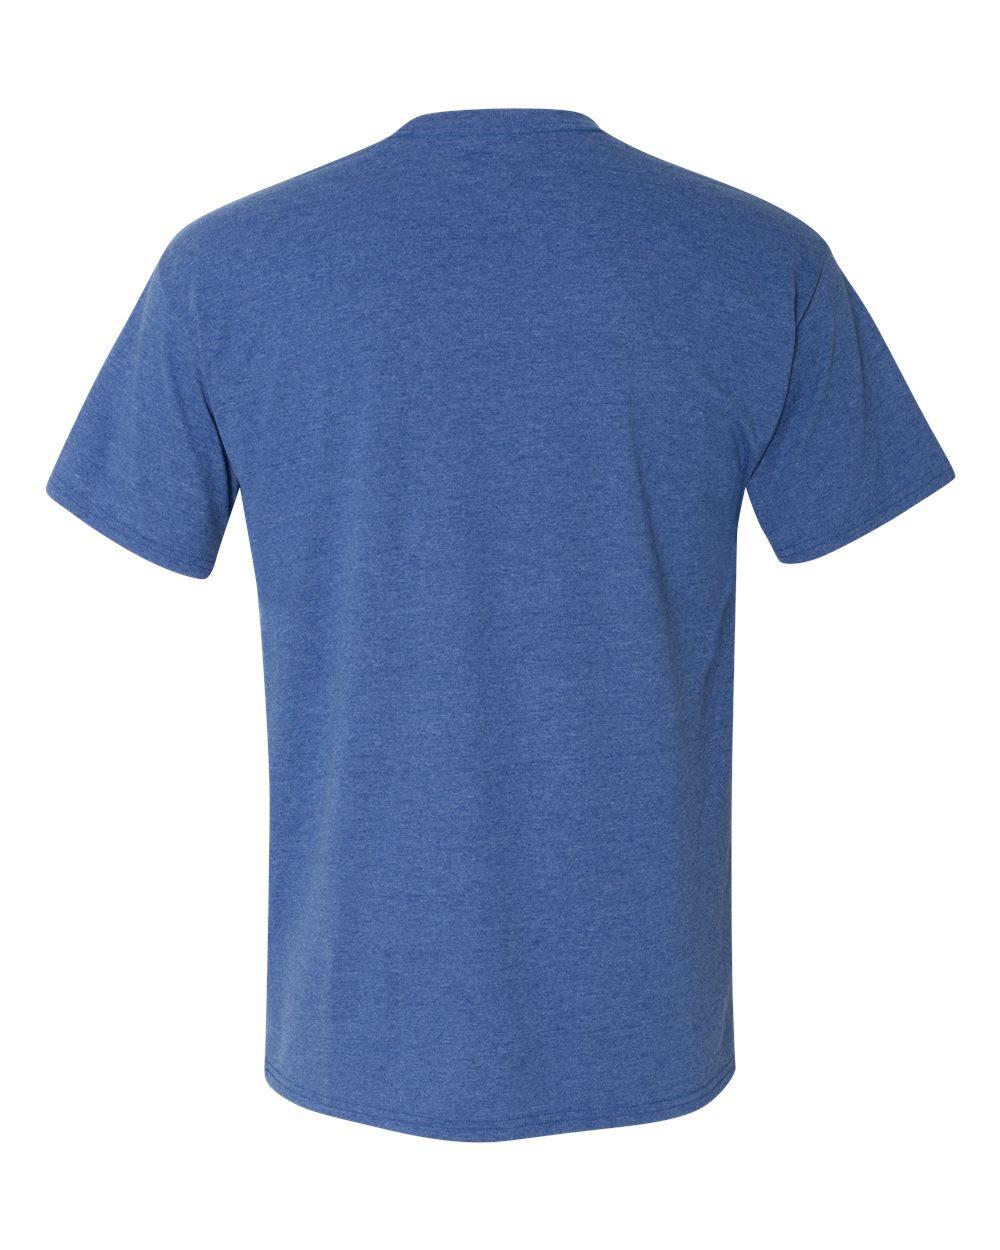 Hanes-Men-039-s-X-Temp-Triblend-T-Shirt-With-Fresh-Iq-42TB-S-3XL thumbnail 27